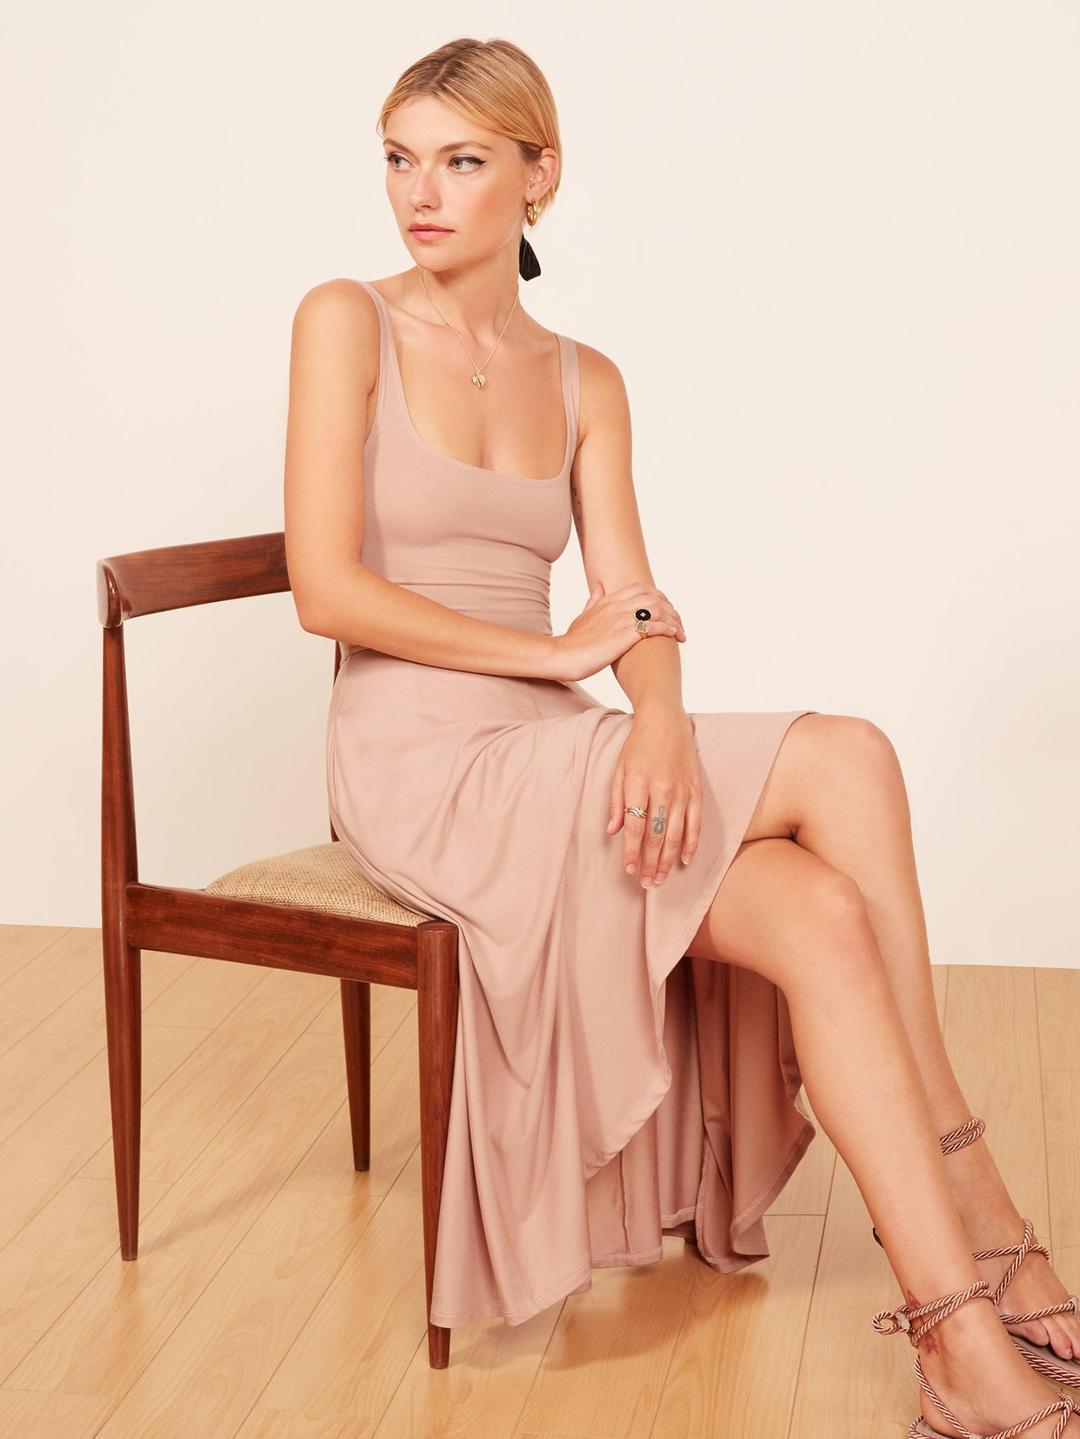 d1586113d7 Reformation's Best-Selling $98 Dress Is Back | WhoWhatWear.com | Bloglovin'